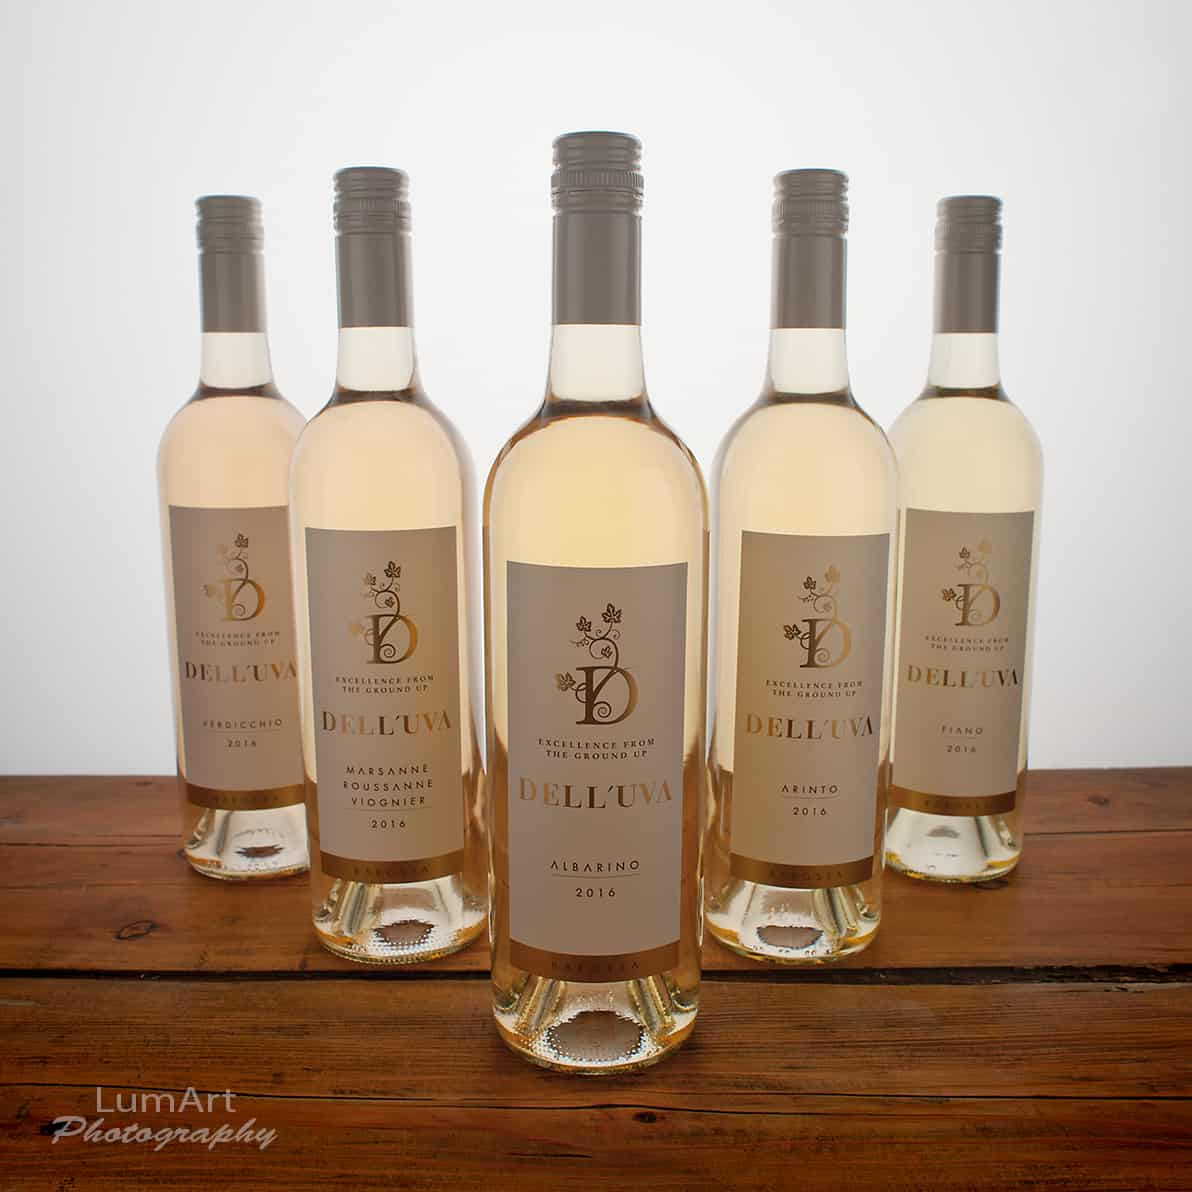 LumArt_Food and Wine_16_Delluva_White_Collection